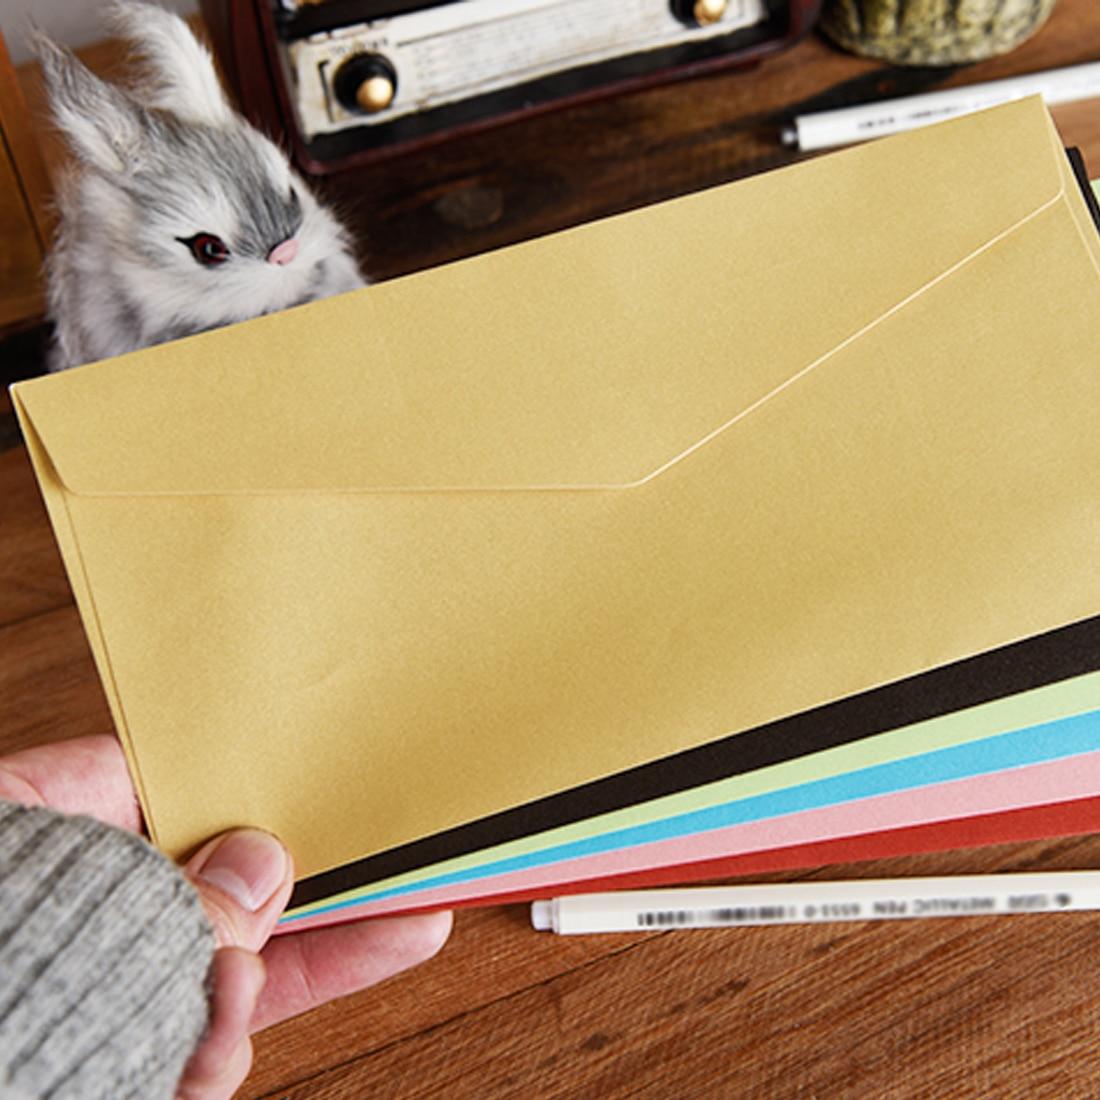 FangNymph 20pcs Classical Kraft Envelopes European Retro Paper Envelope Blank Envelops 11*22cm Office Supplier Stationery